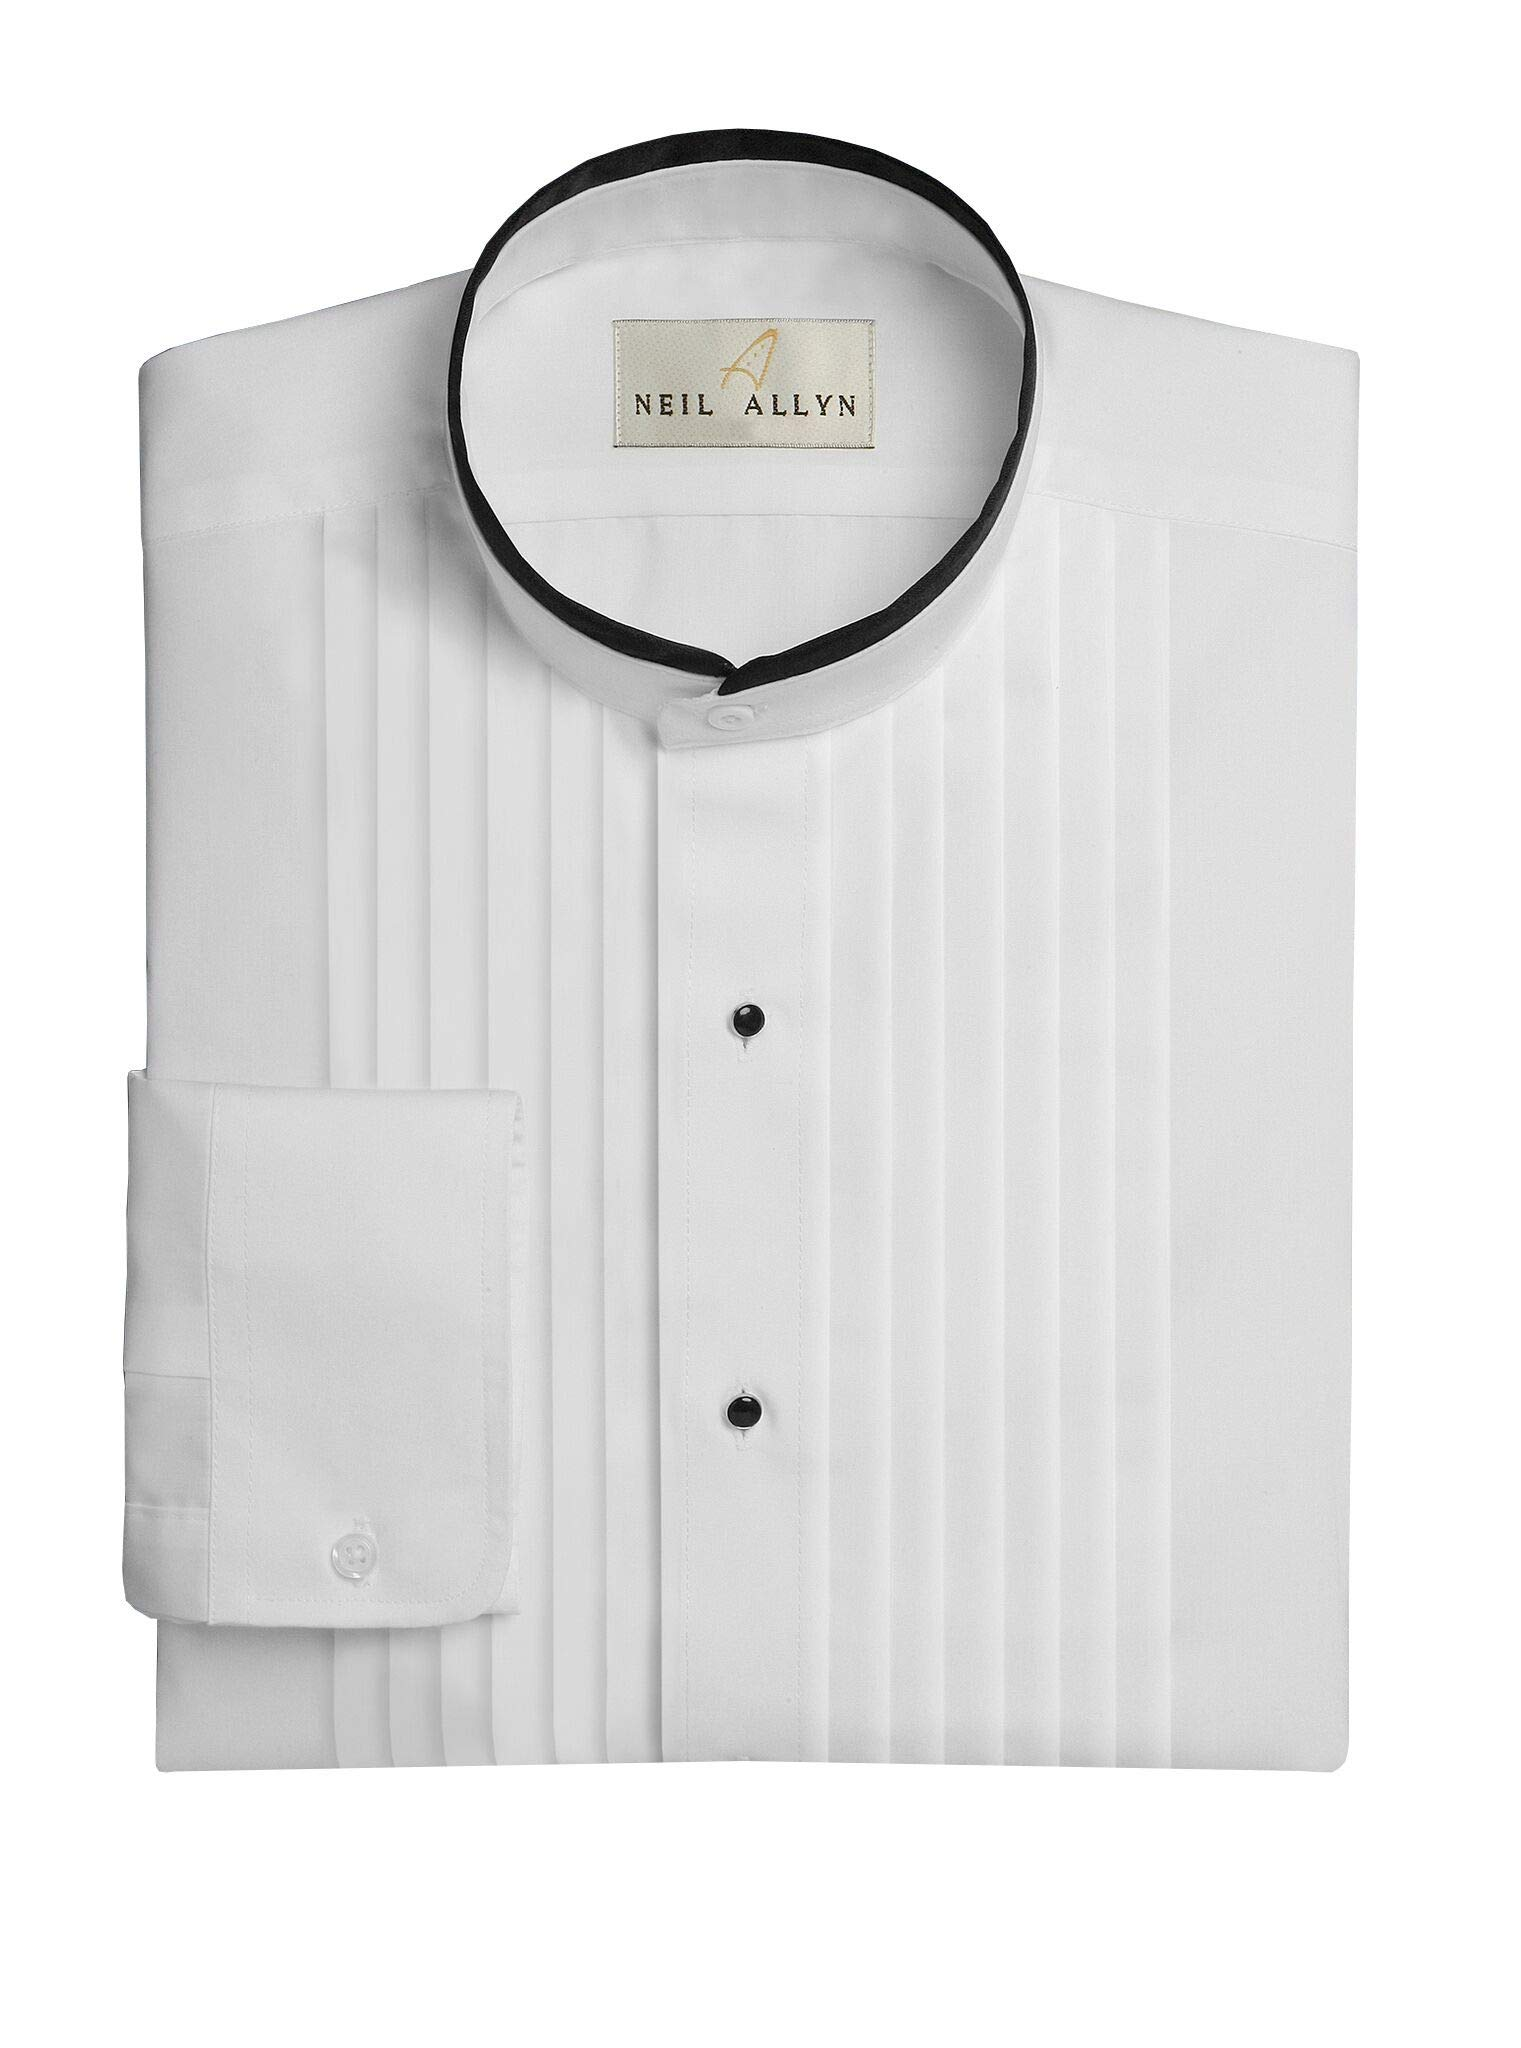 Neil Allyn Men's Banded Collar 1/2'' Pleats Tuxedo Shirt with Black Piping-3XL-36-37 by Neil Allyn